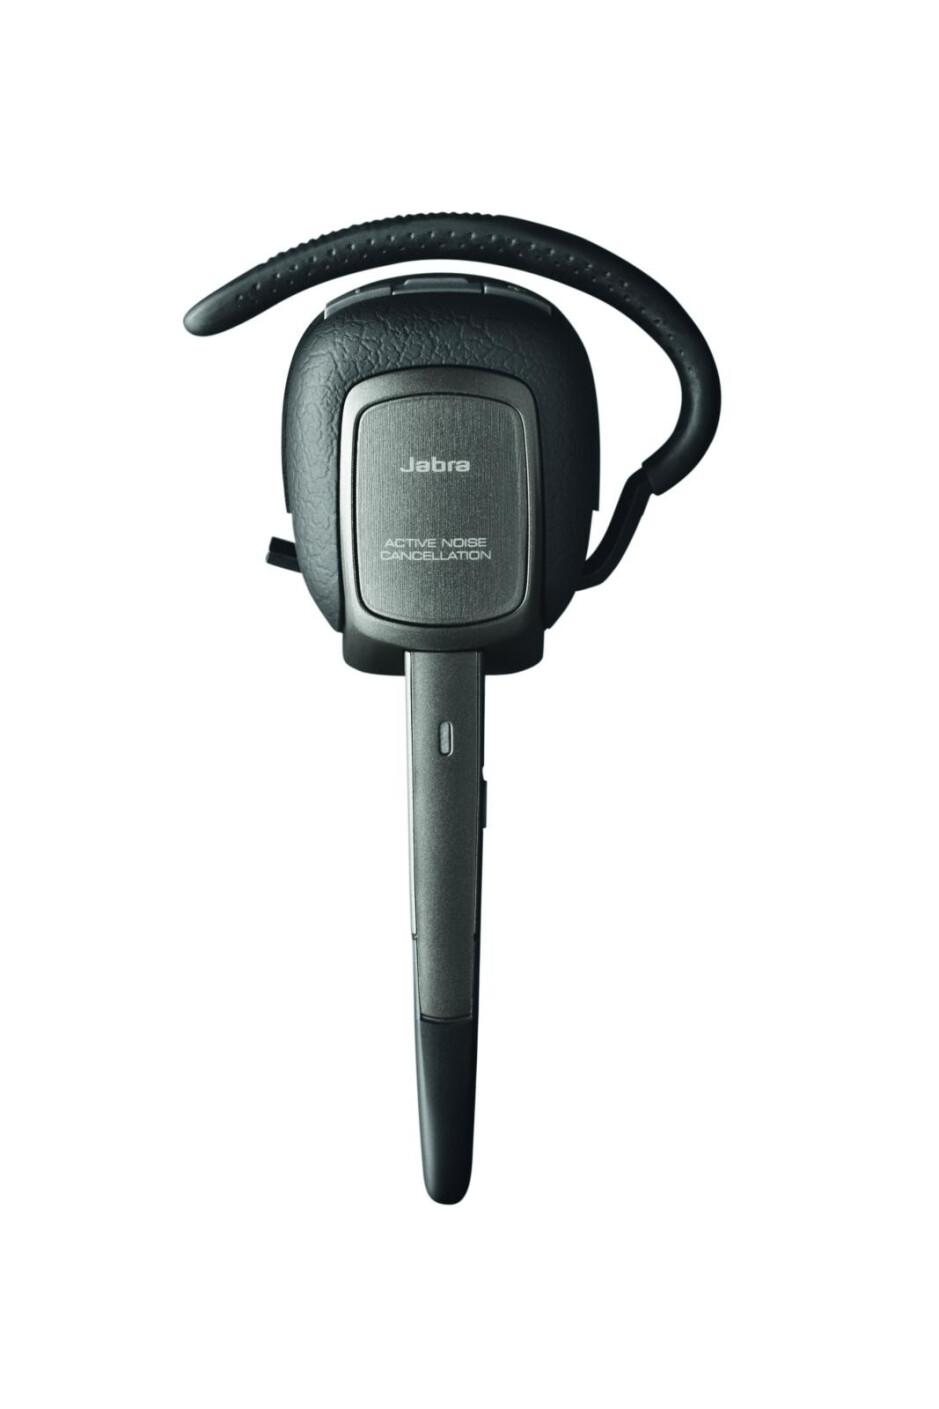 Jabra SUPREME - Jabra SUPREME and EXTREME2 Bluetooth headsets feature Noise Blackout 3.0 technology